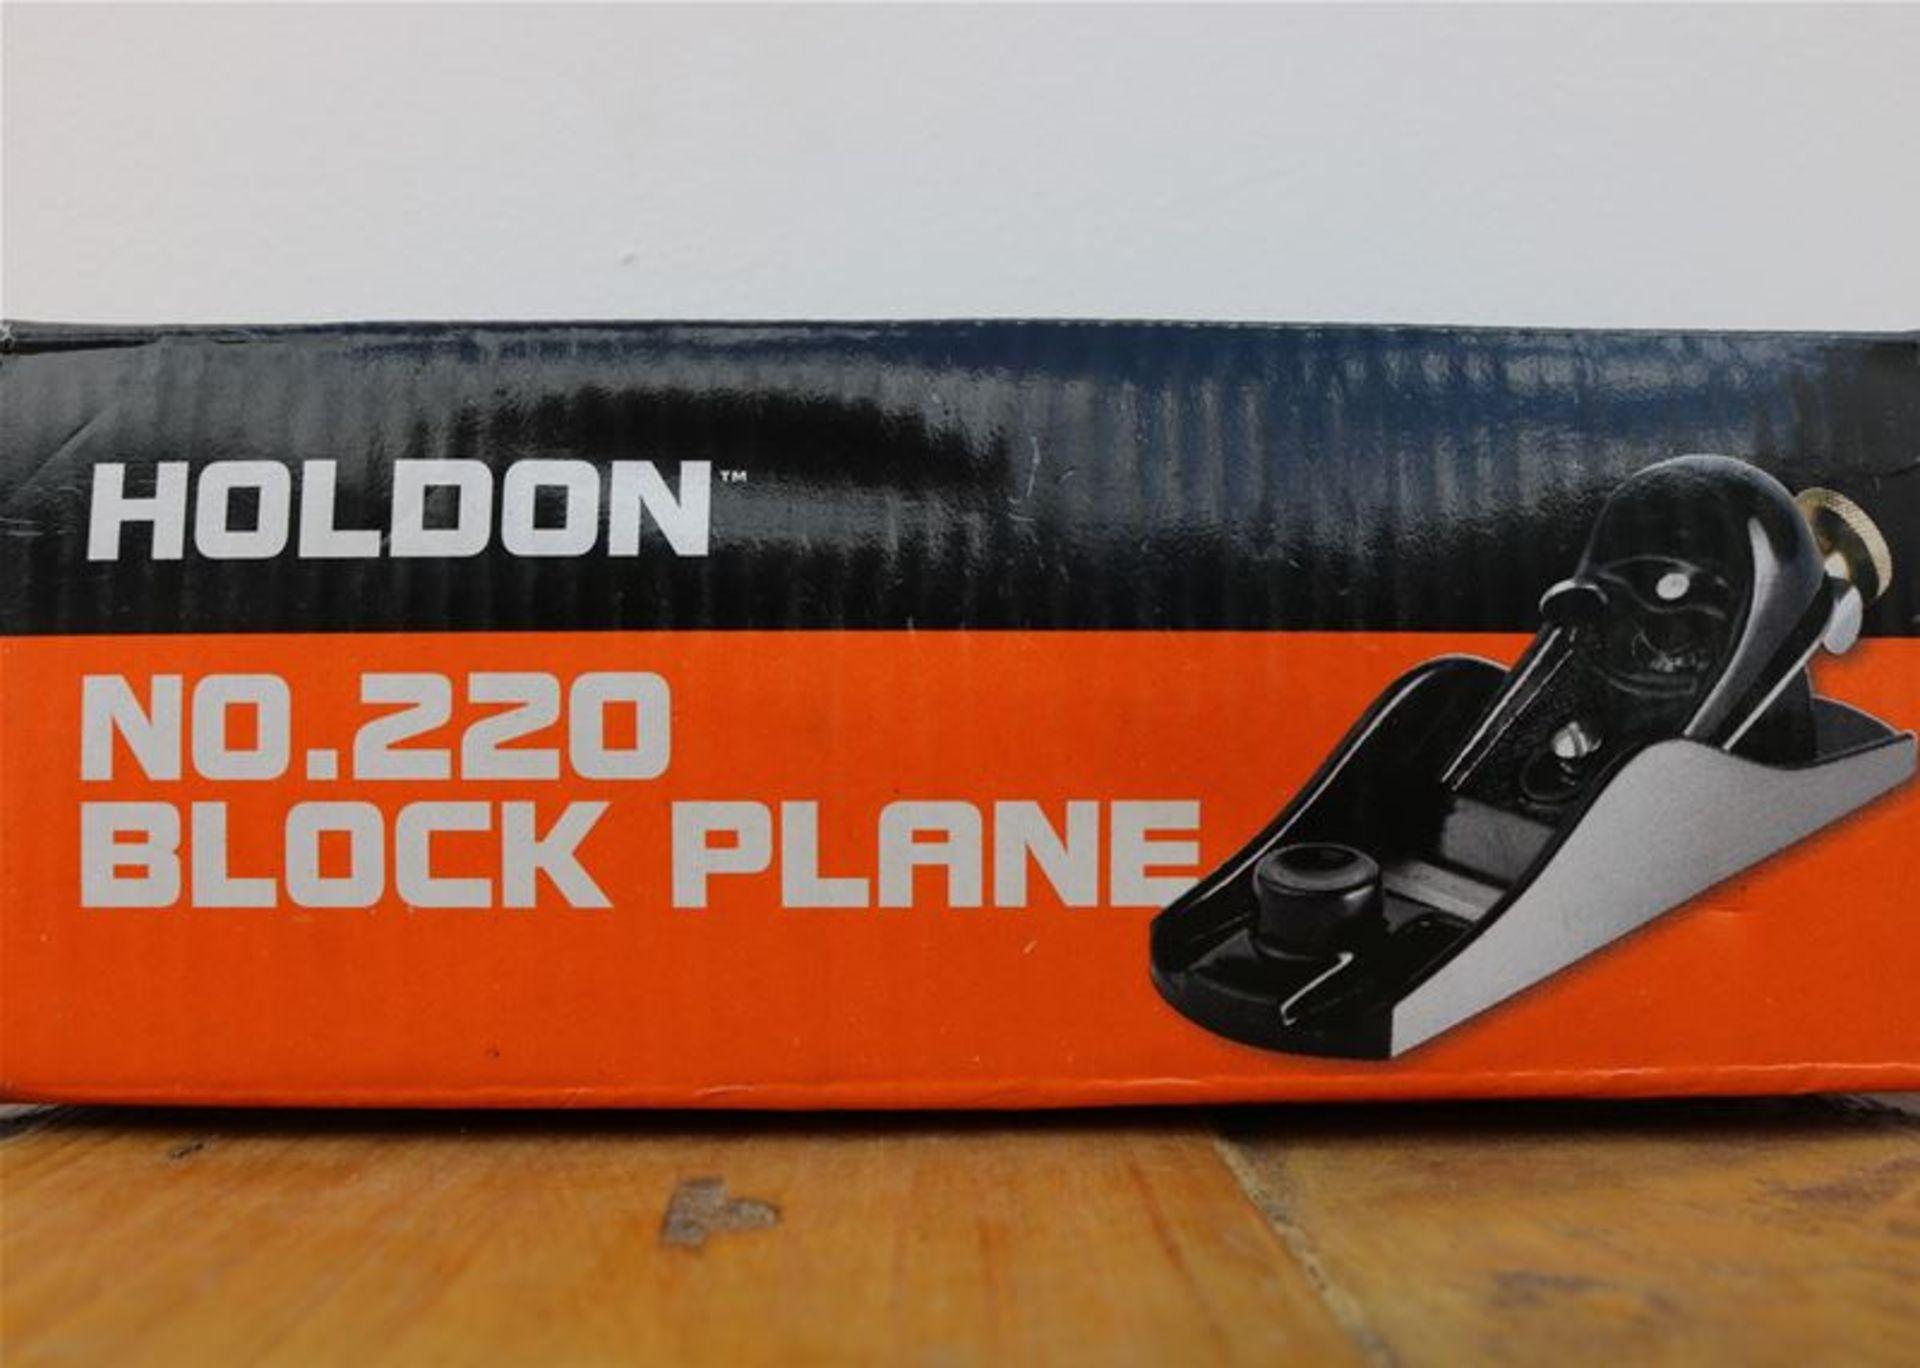 Los 61 - 10 x HOLDON No.220 Block Plane